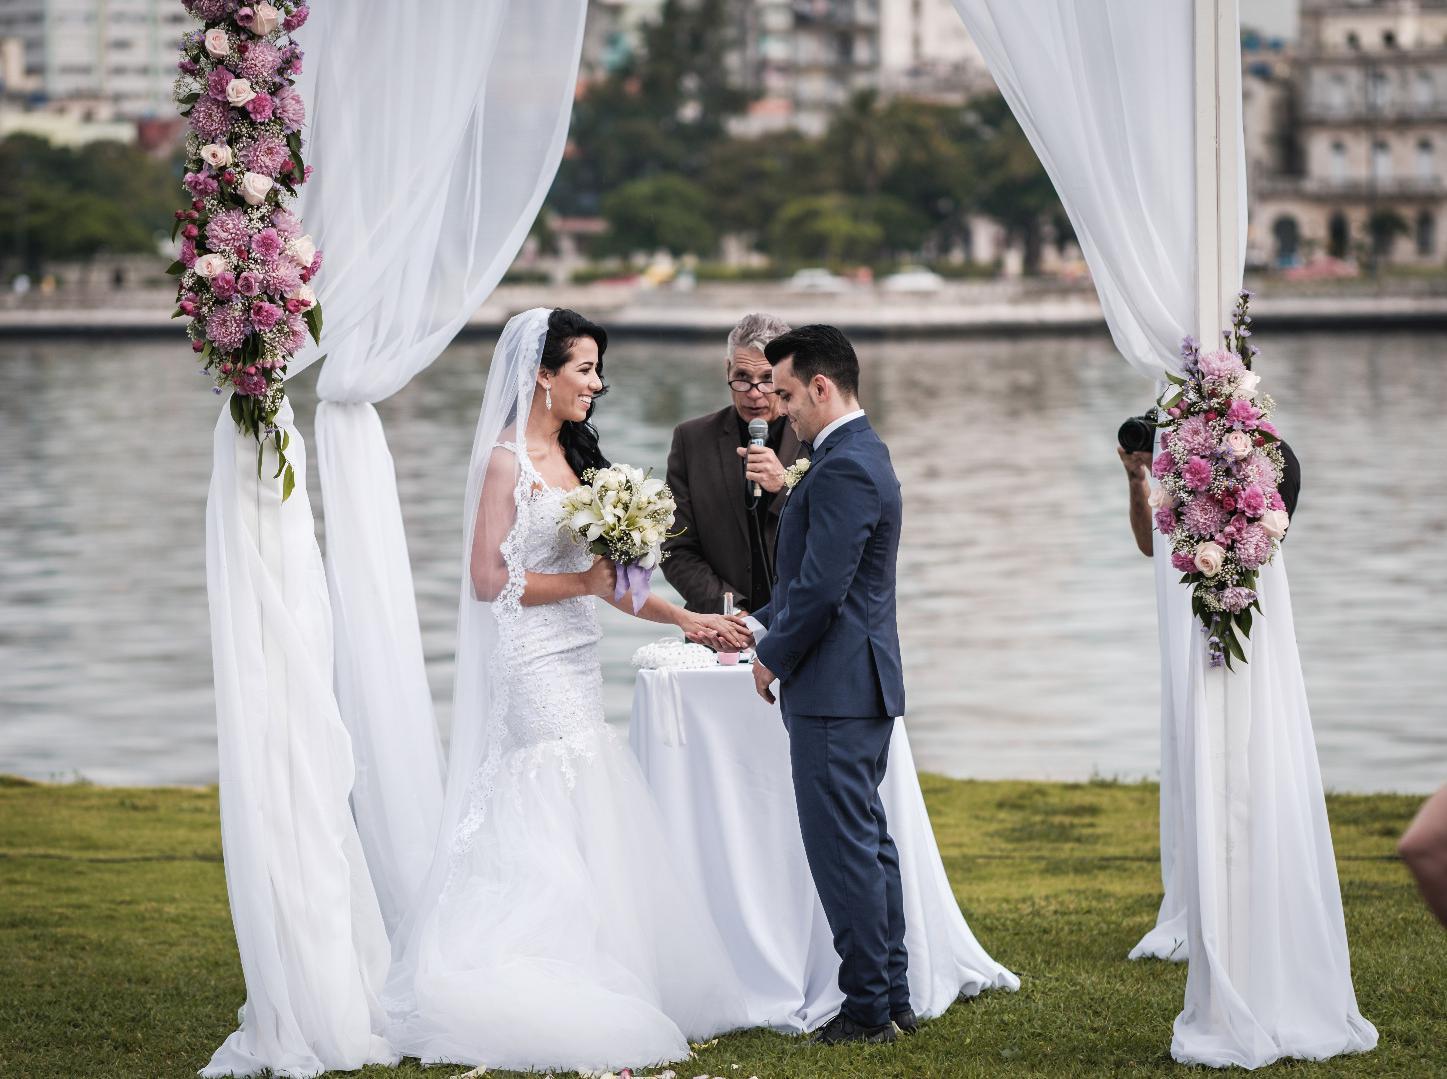 bodas-sin-clasificar-sin-tema-cuba-35582.jpg